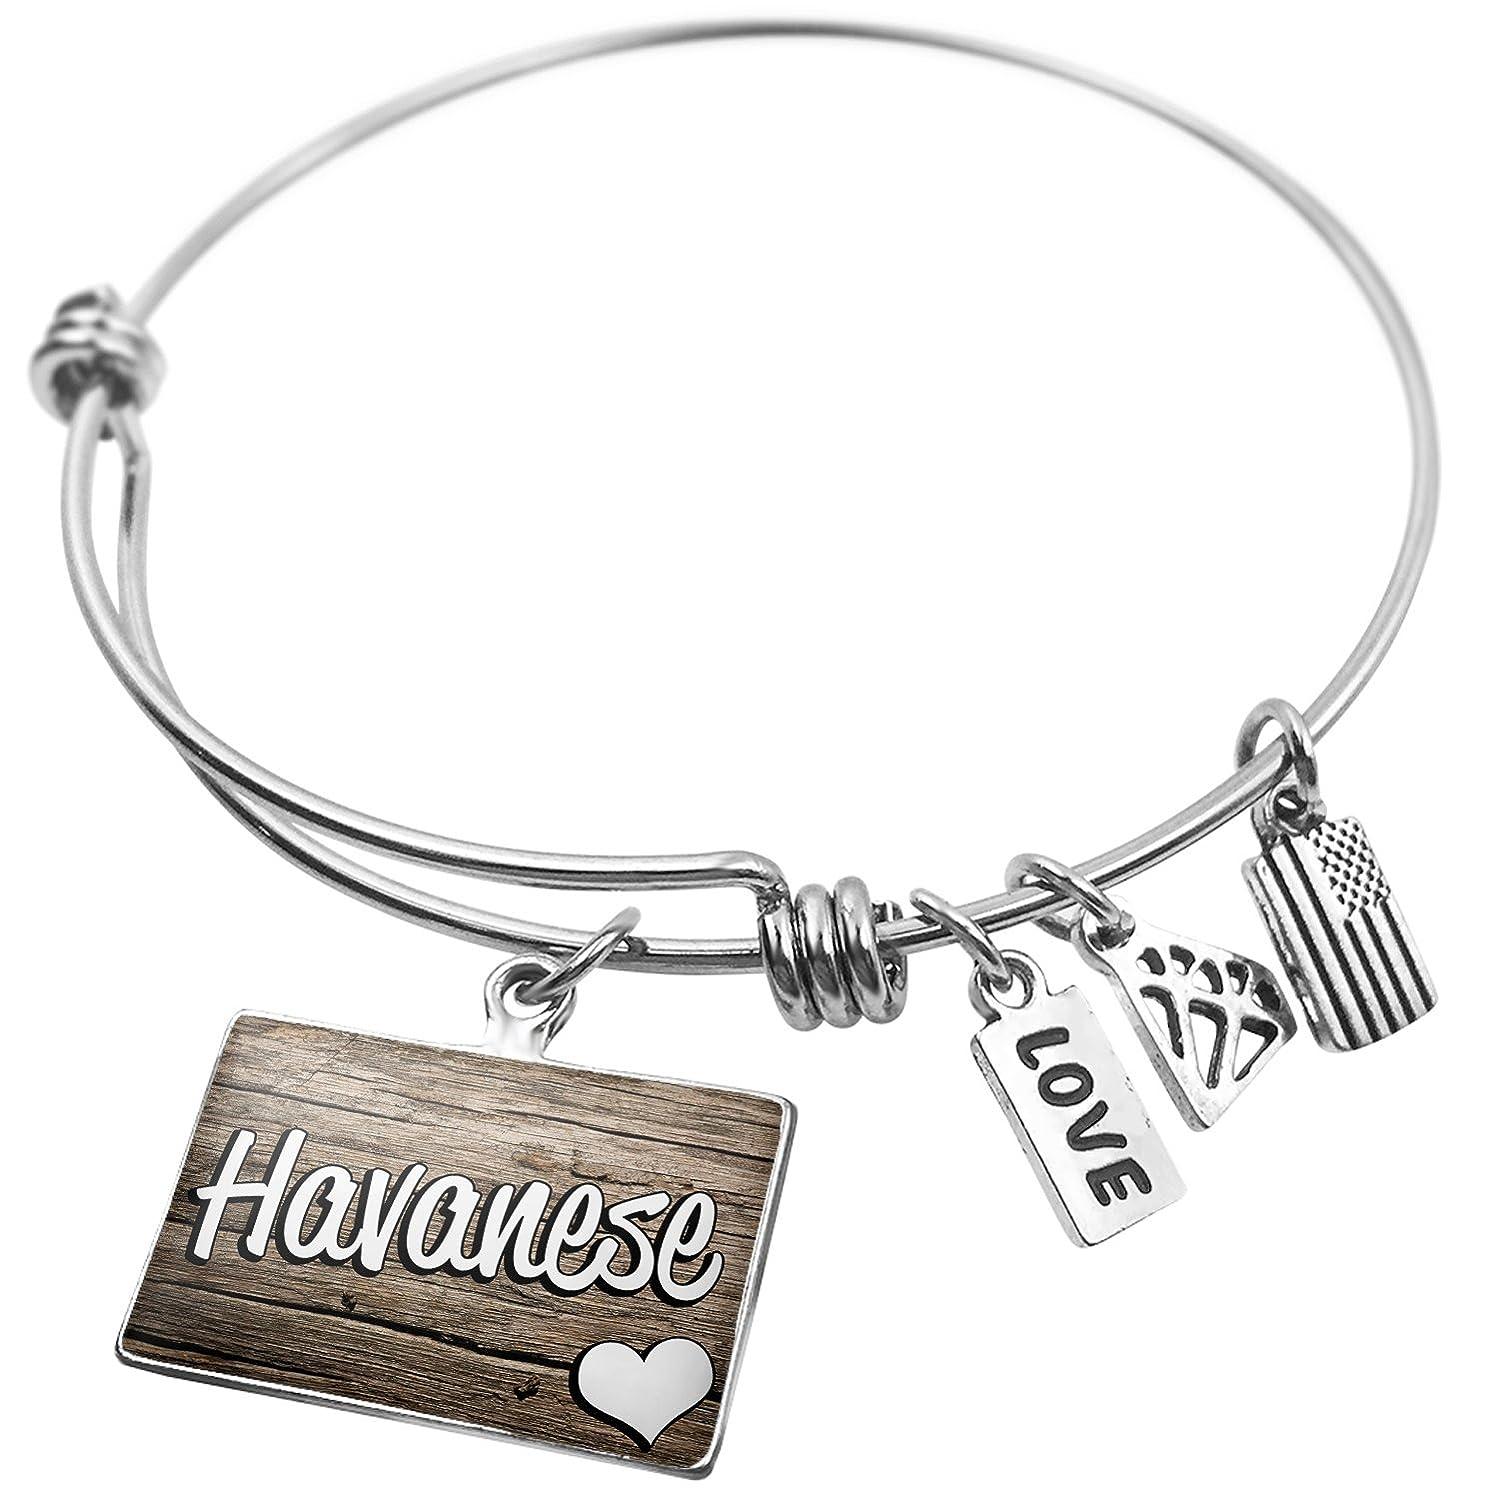 NEONBLOND Expandable Wire Bangle Bracelet Havanese, Dog Breed